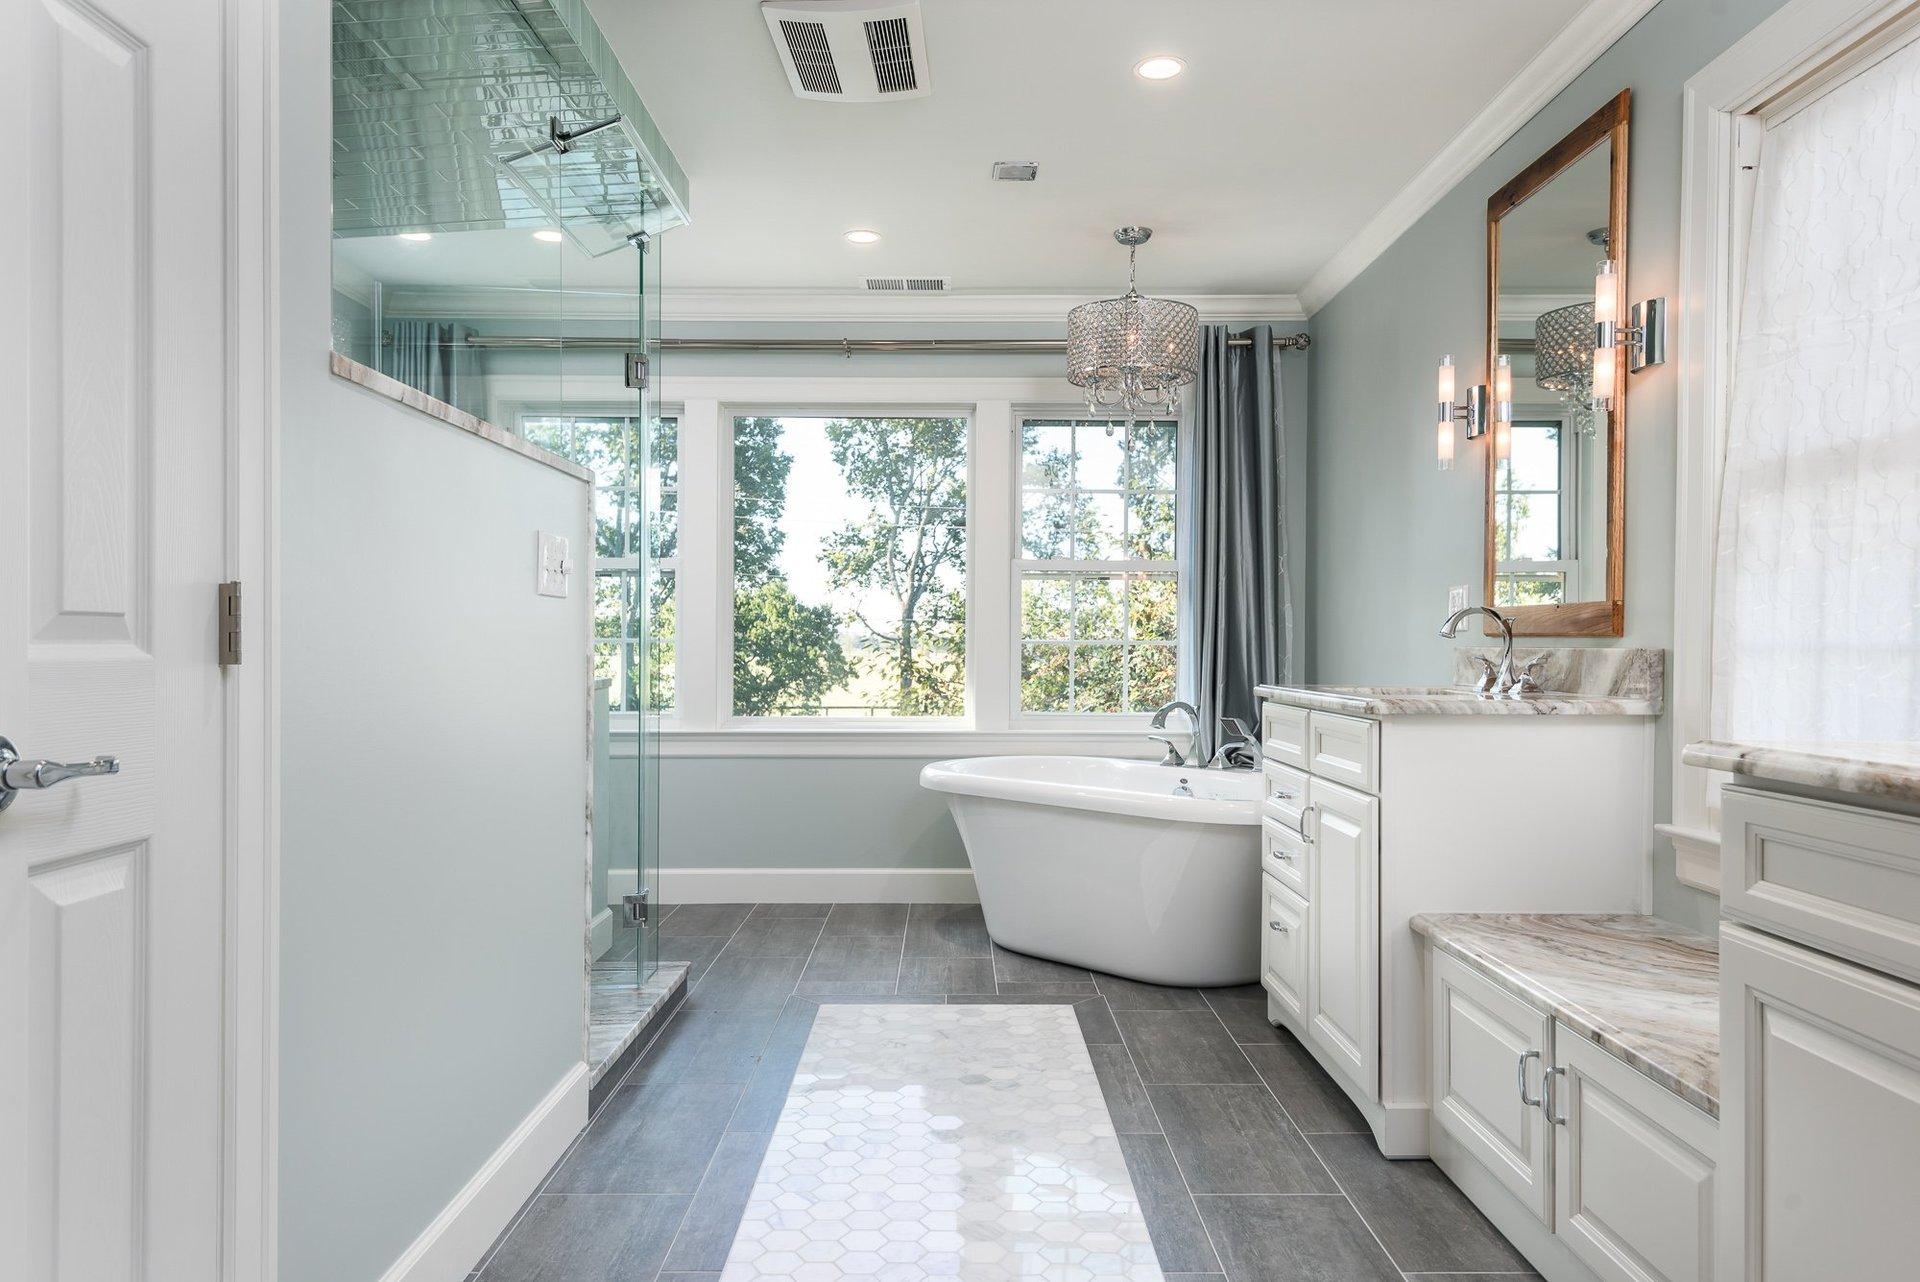 General contractors remodeling in lexington ky cincinnati oh for Bathroom remodel lexington ky